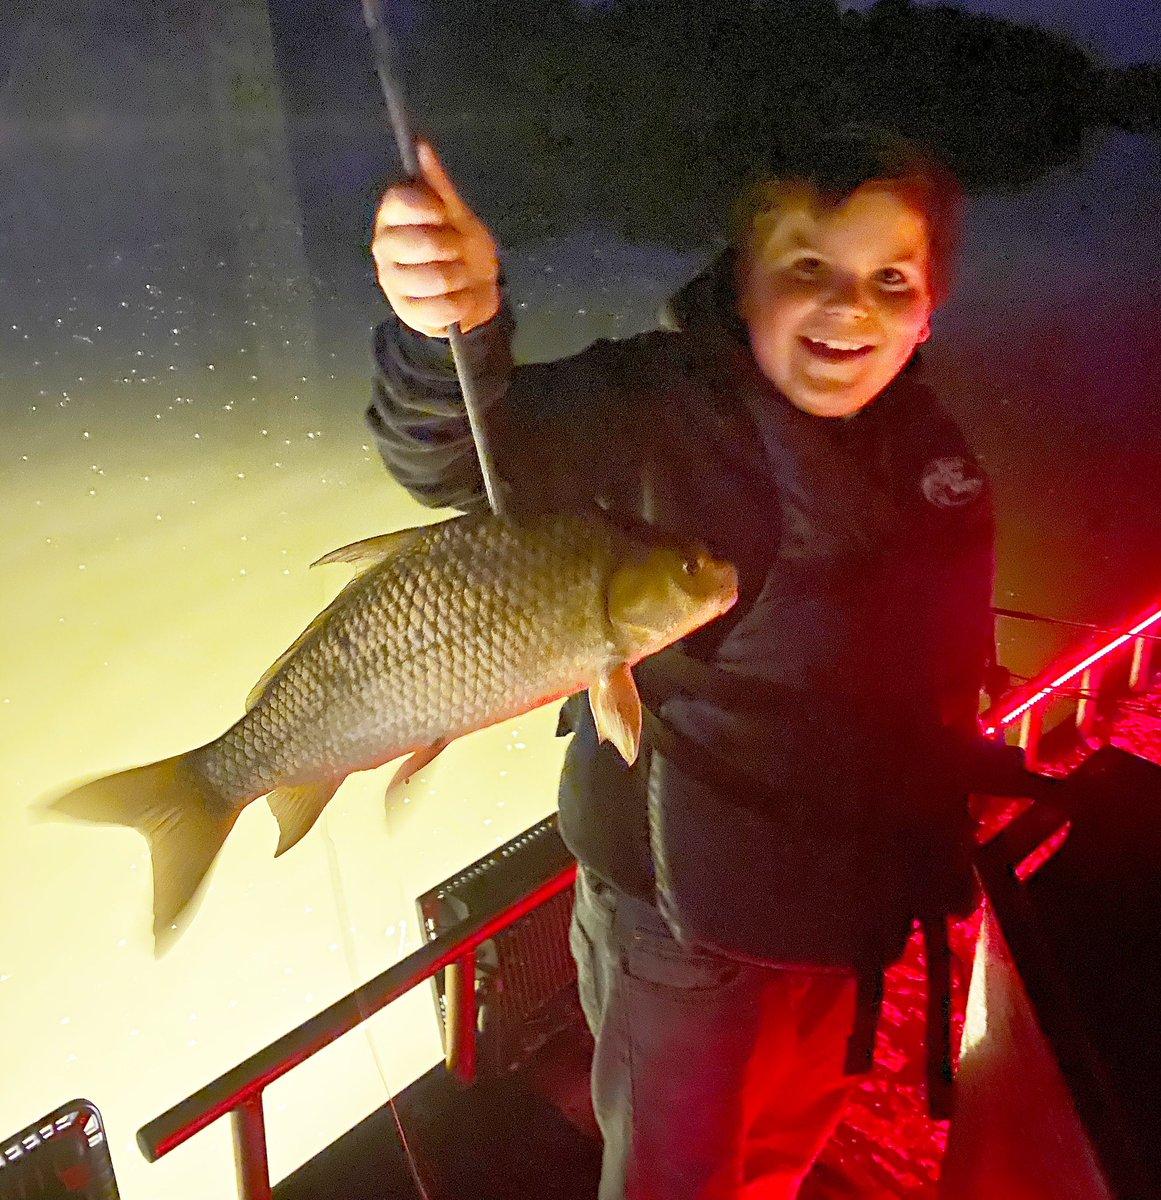 His smile says it all!!!!🏹🏹🎣 #kidsfishing #bowfishing #carpfishing #nightfishing #onthe<b>W